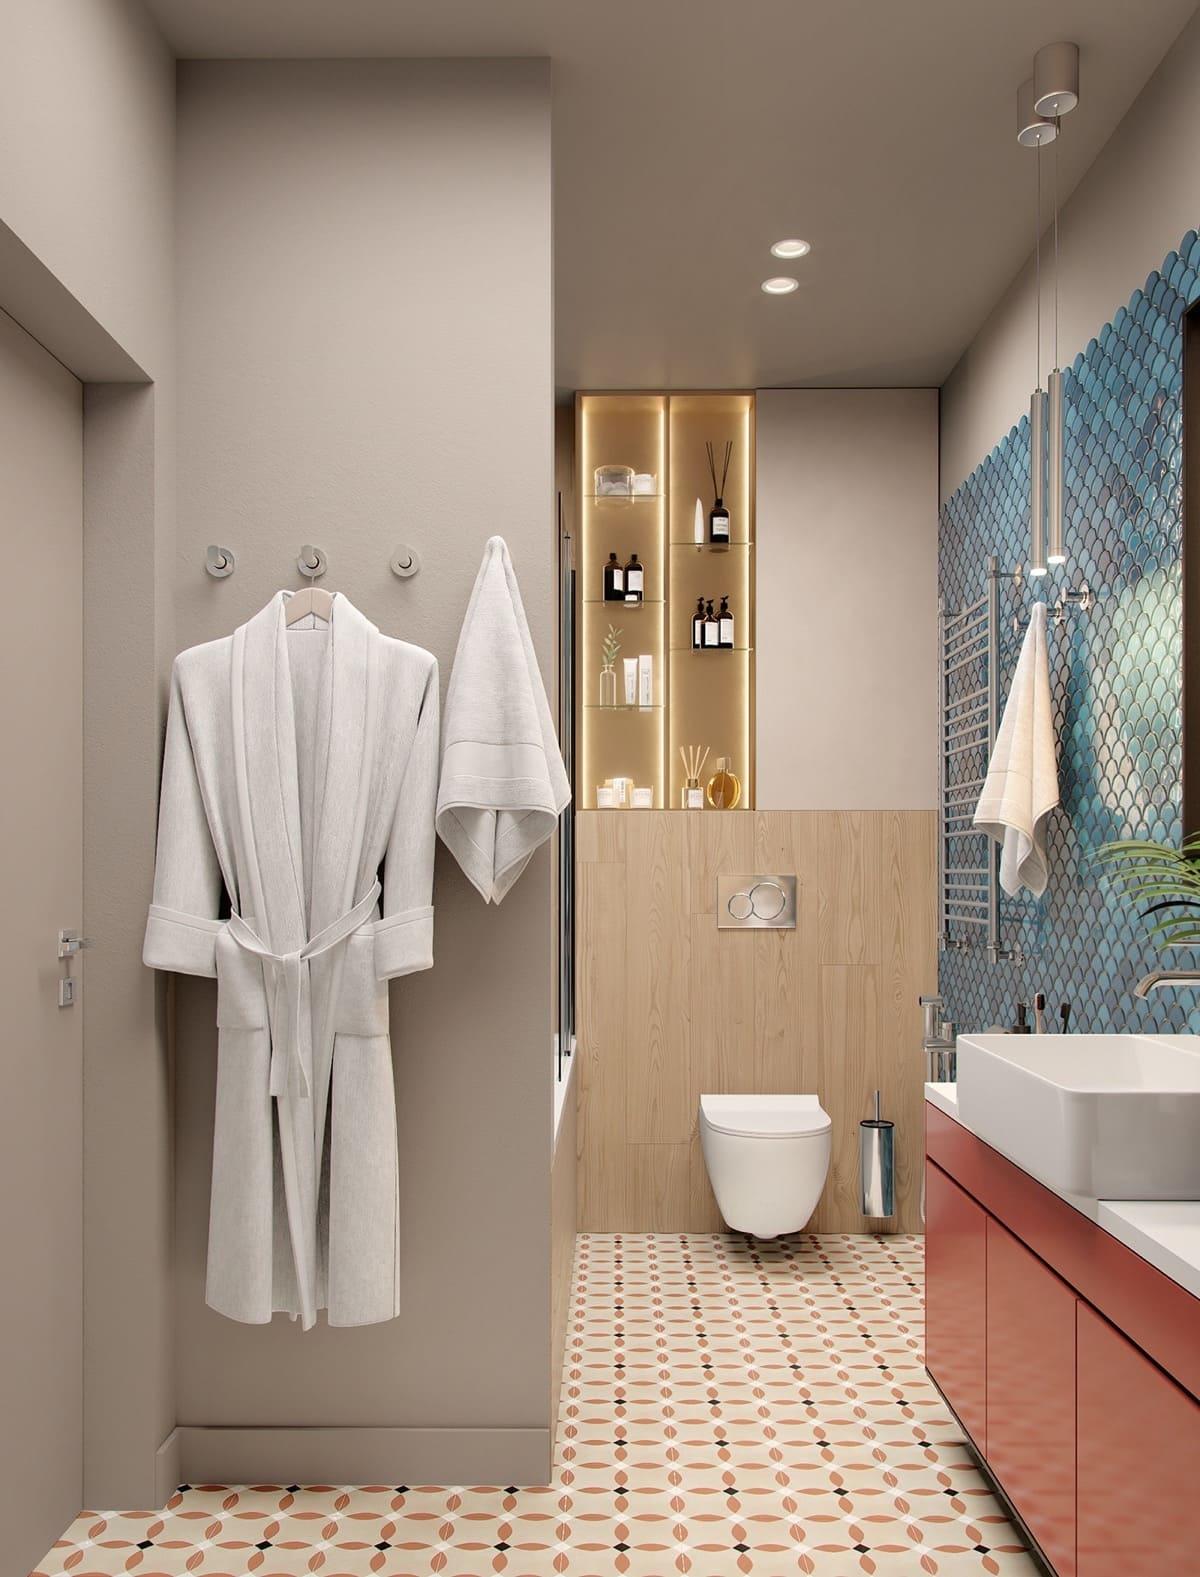 дизайн интерьера модной квартиры фото 60